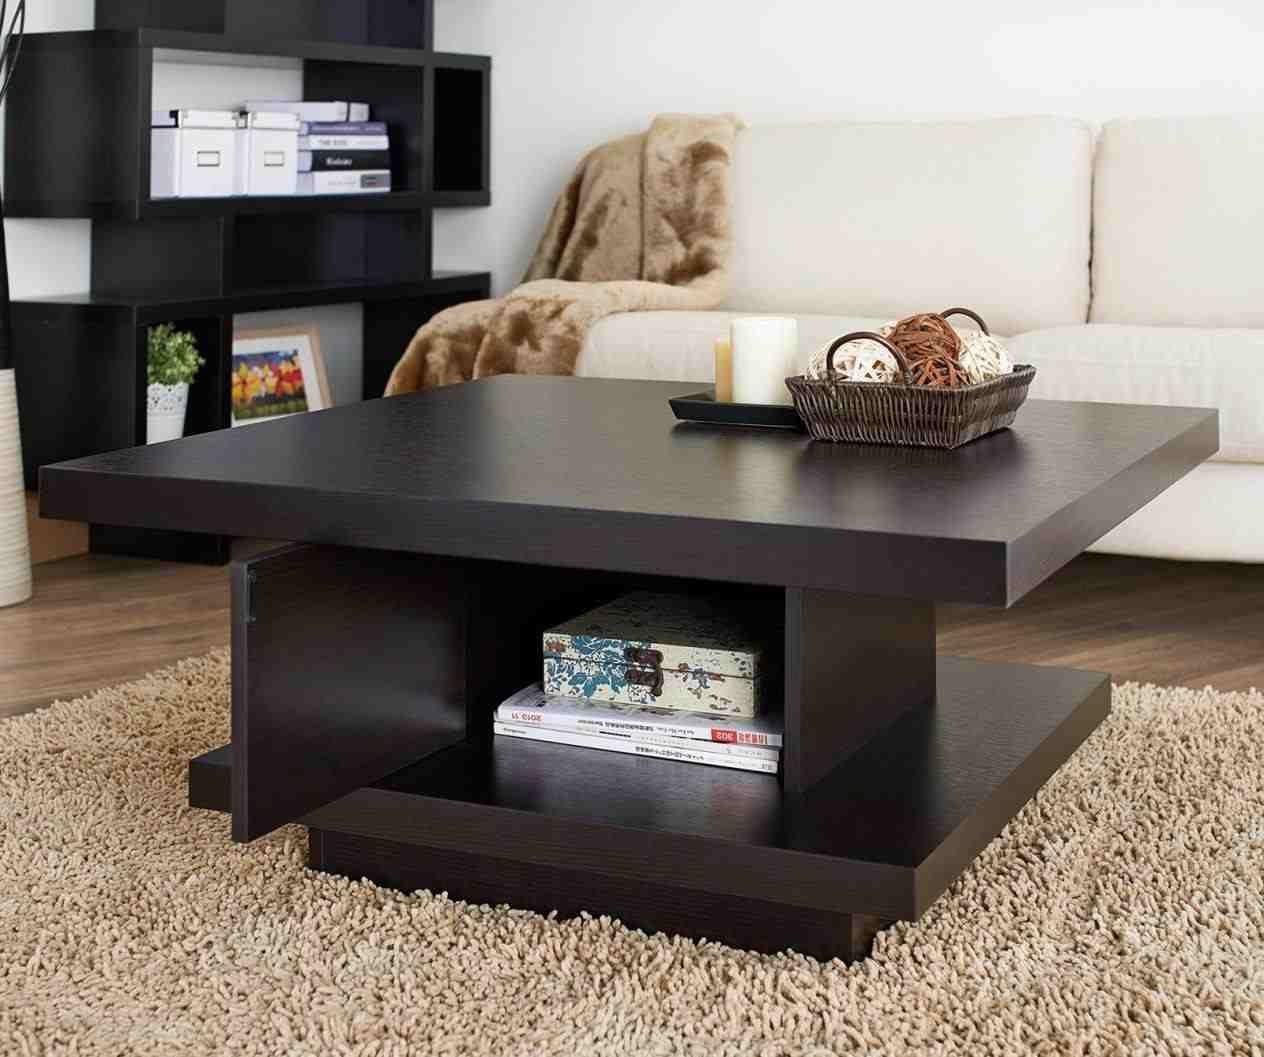 - Coffee Table Books Seinfeld - Designer Coffee Table Books Tables